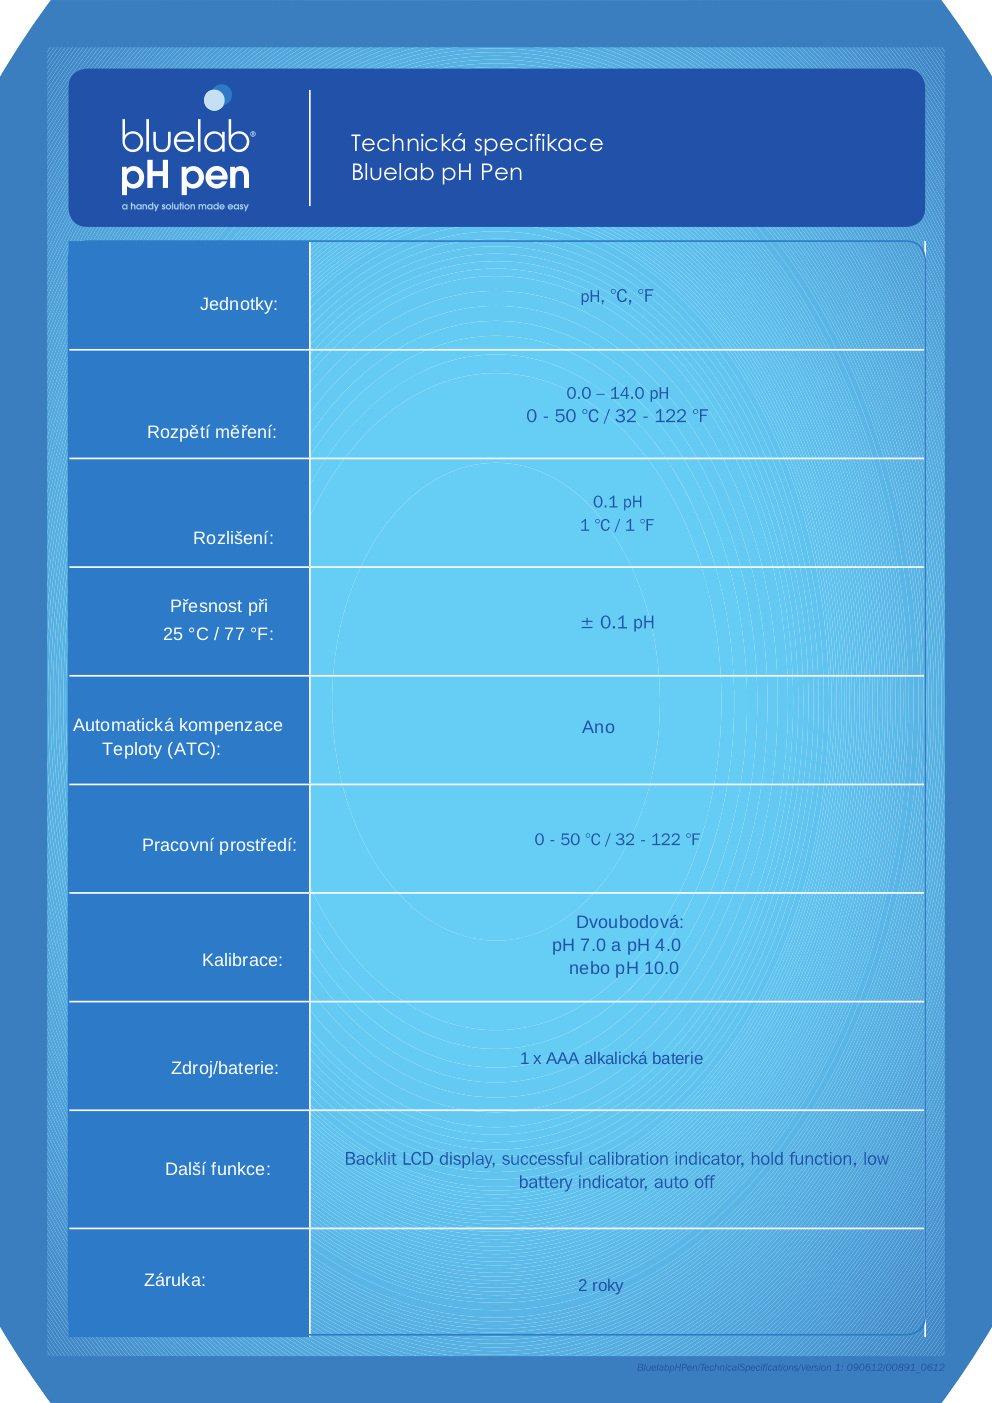 specifikace-bluelab-pH-pen